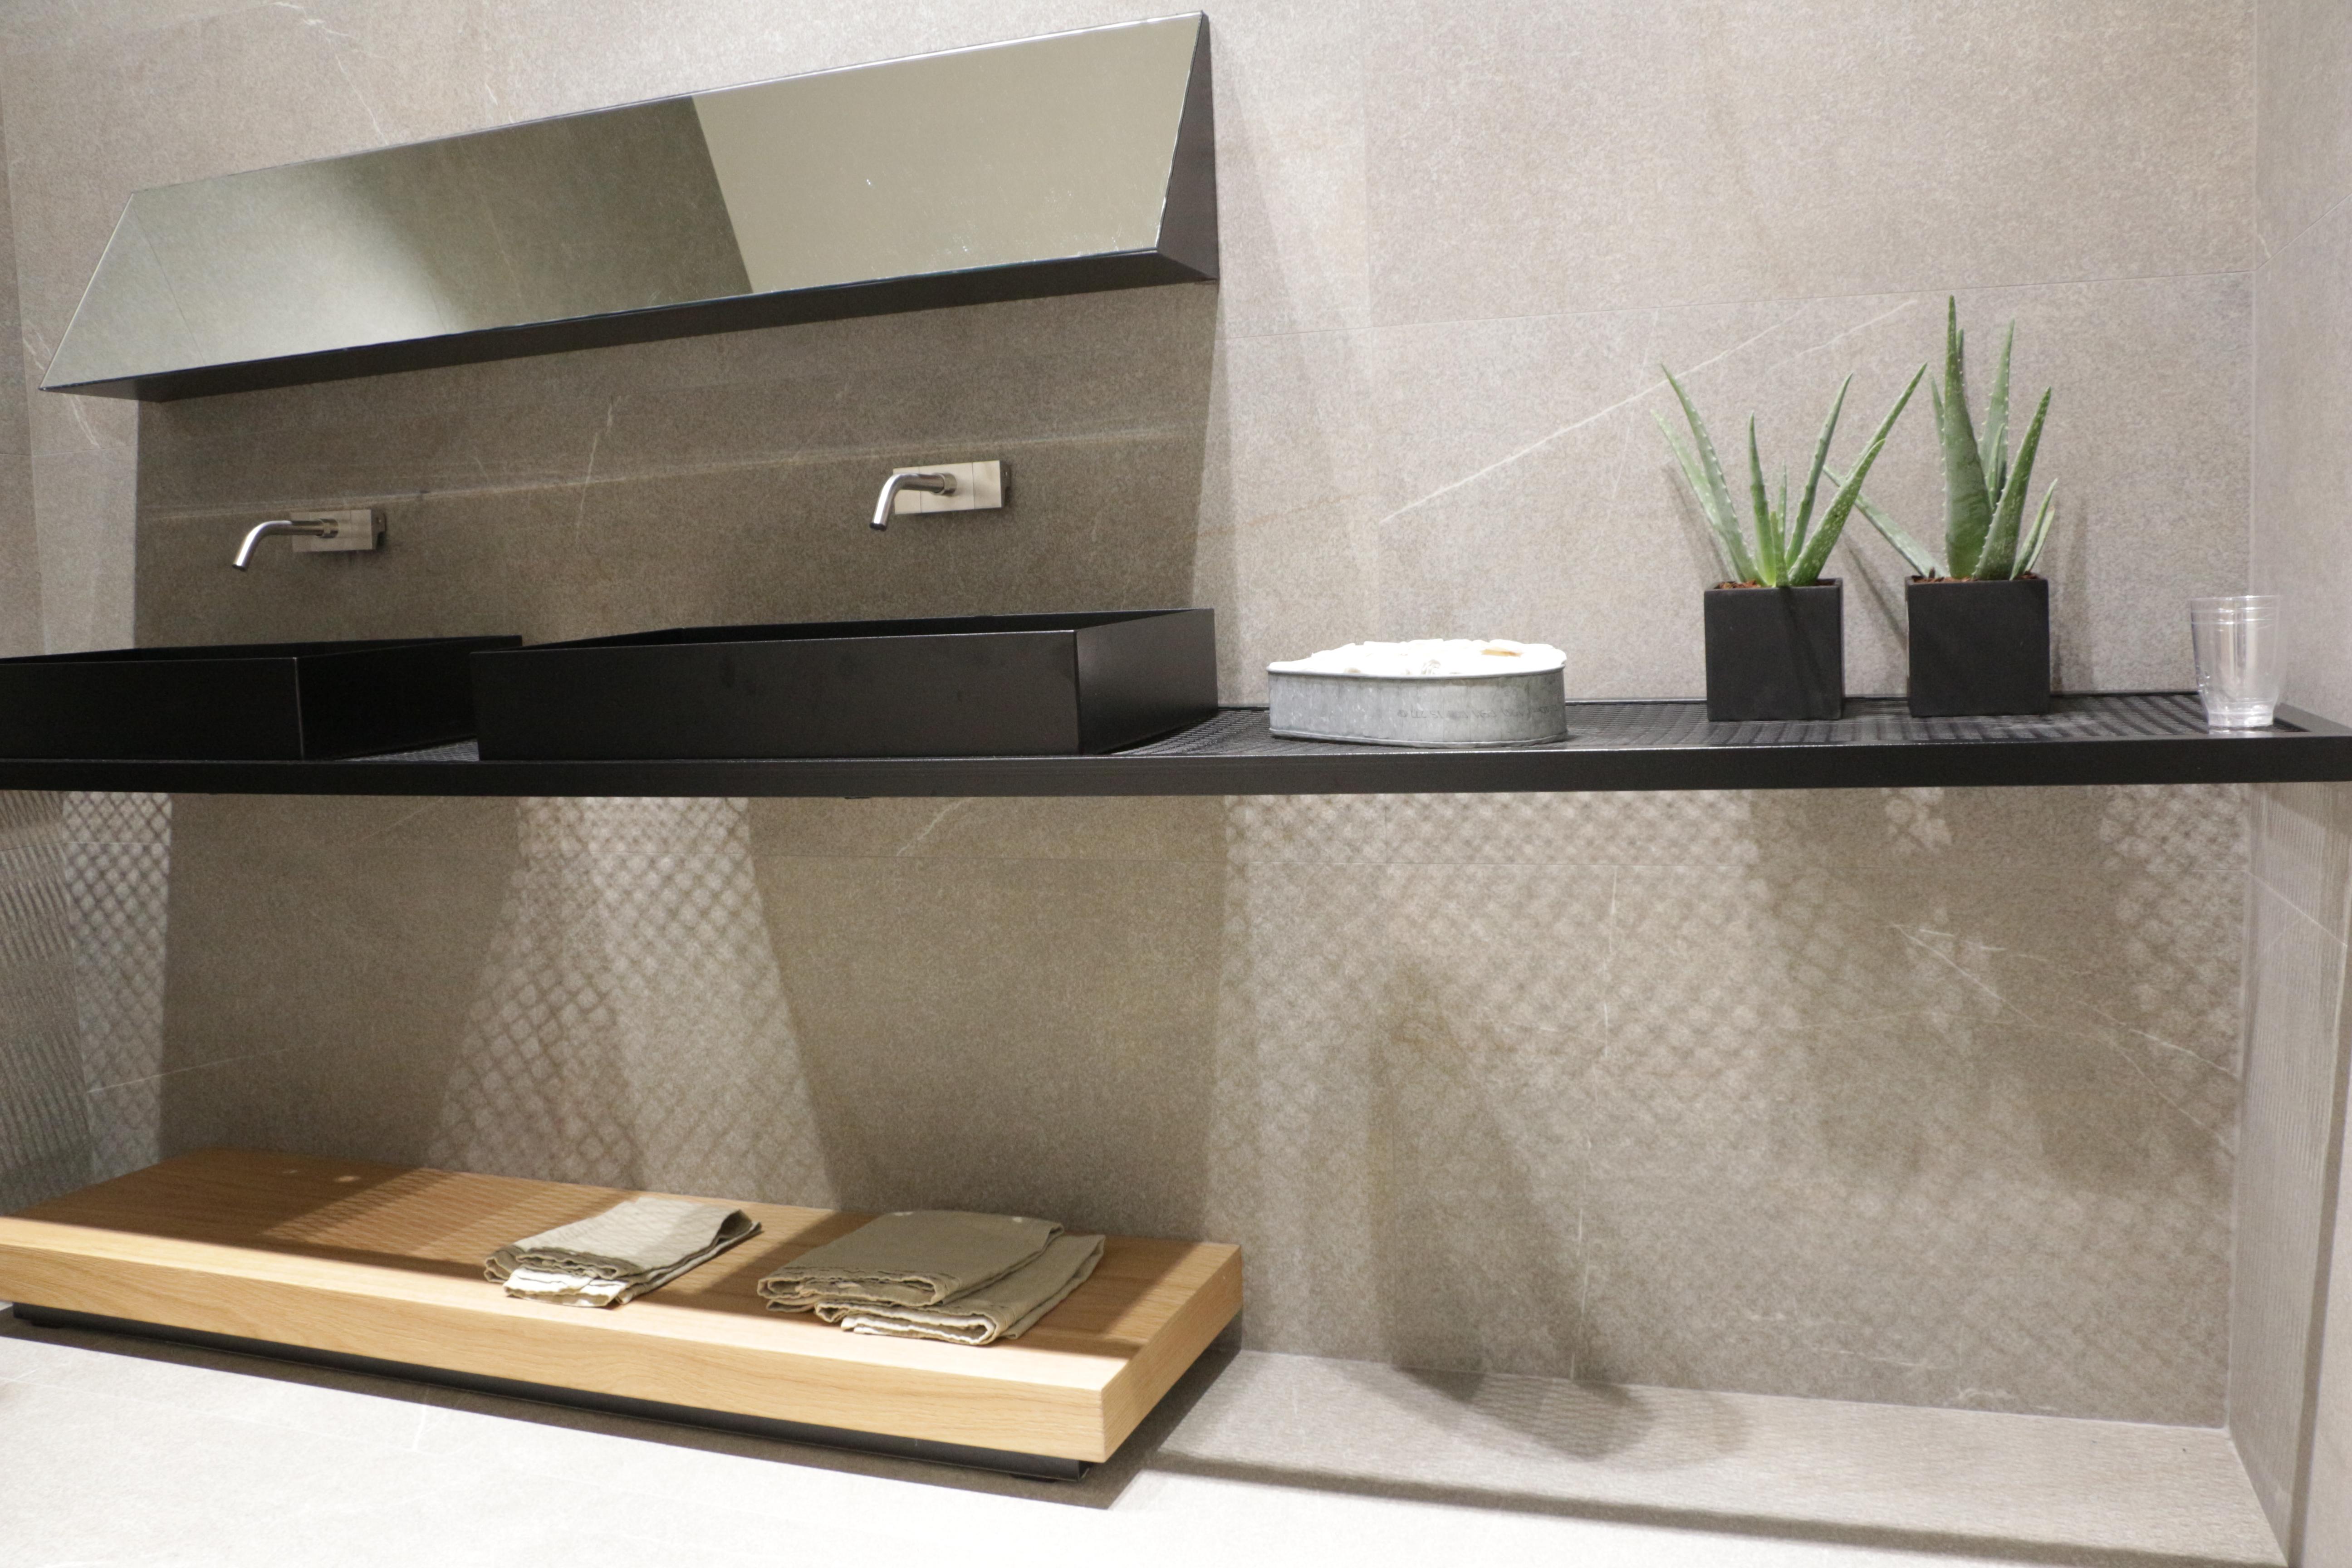 piase neu 2017 emil ceramica online kaufen franke raumwert. Black Bedroom Furniture Sets. Home Design Ideas